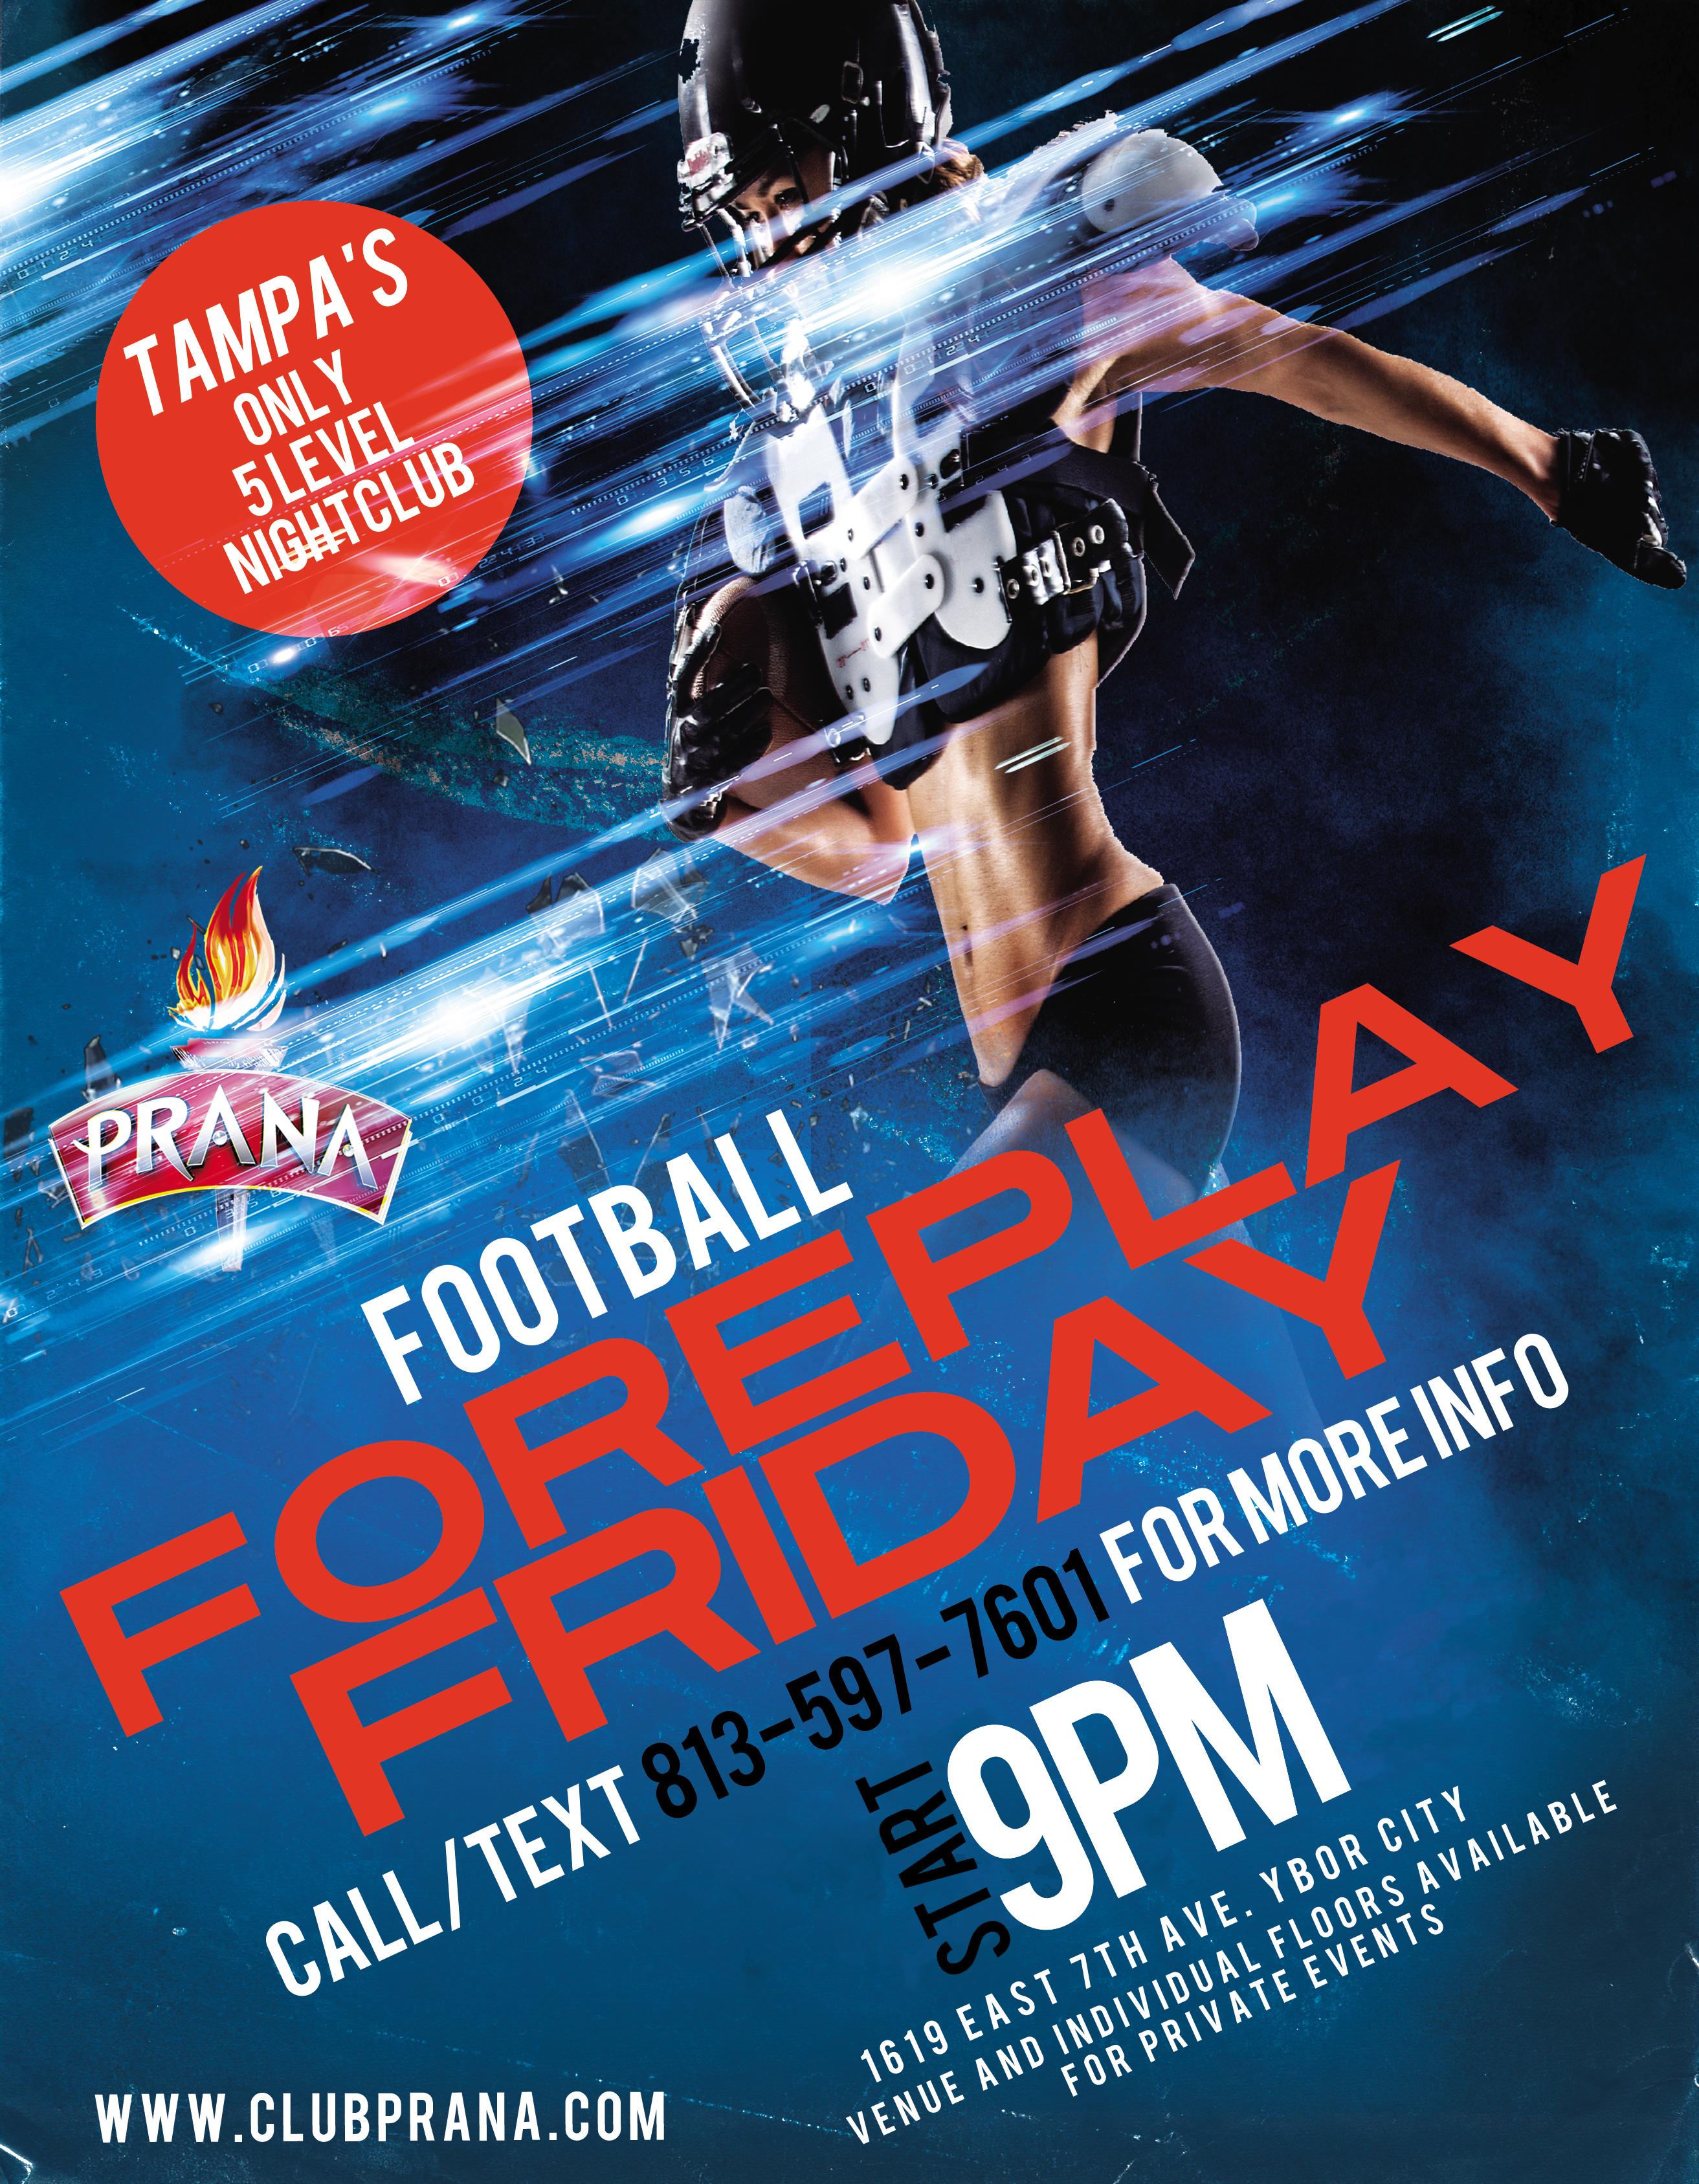 Football Foreplay Friday